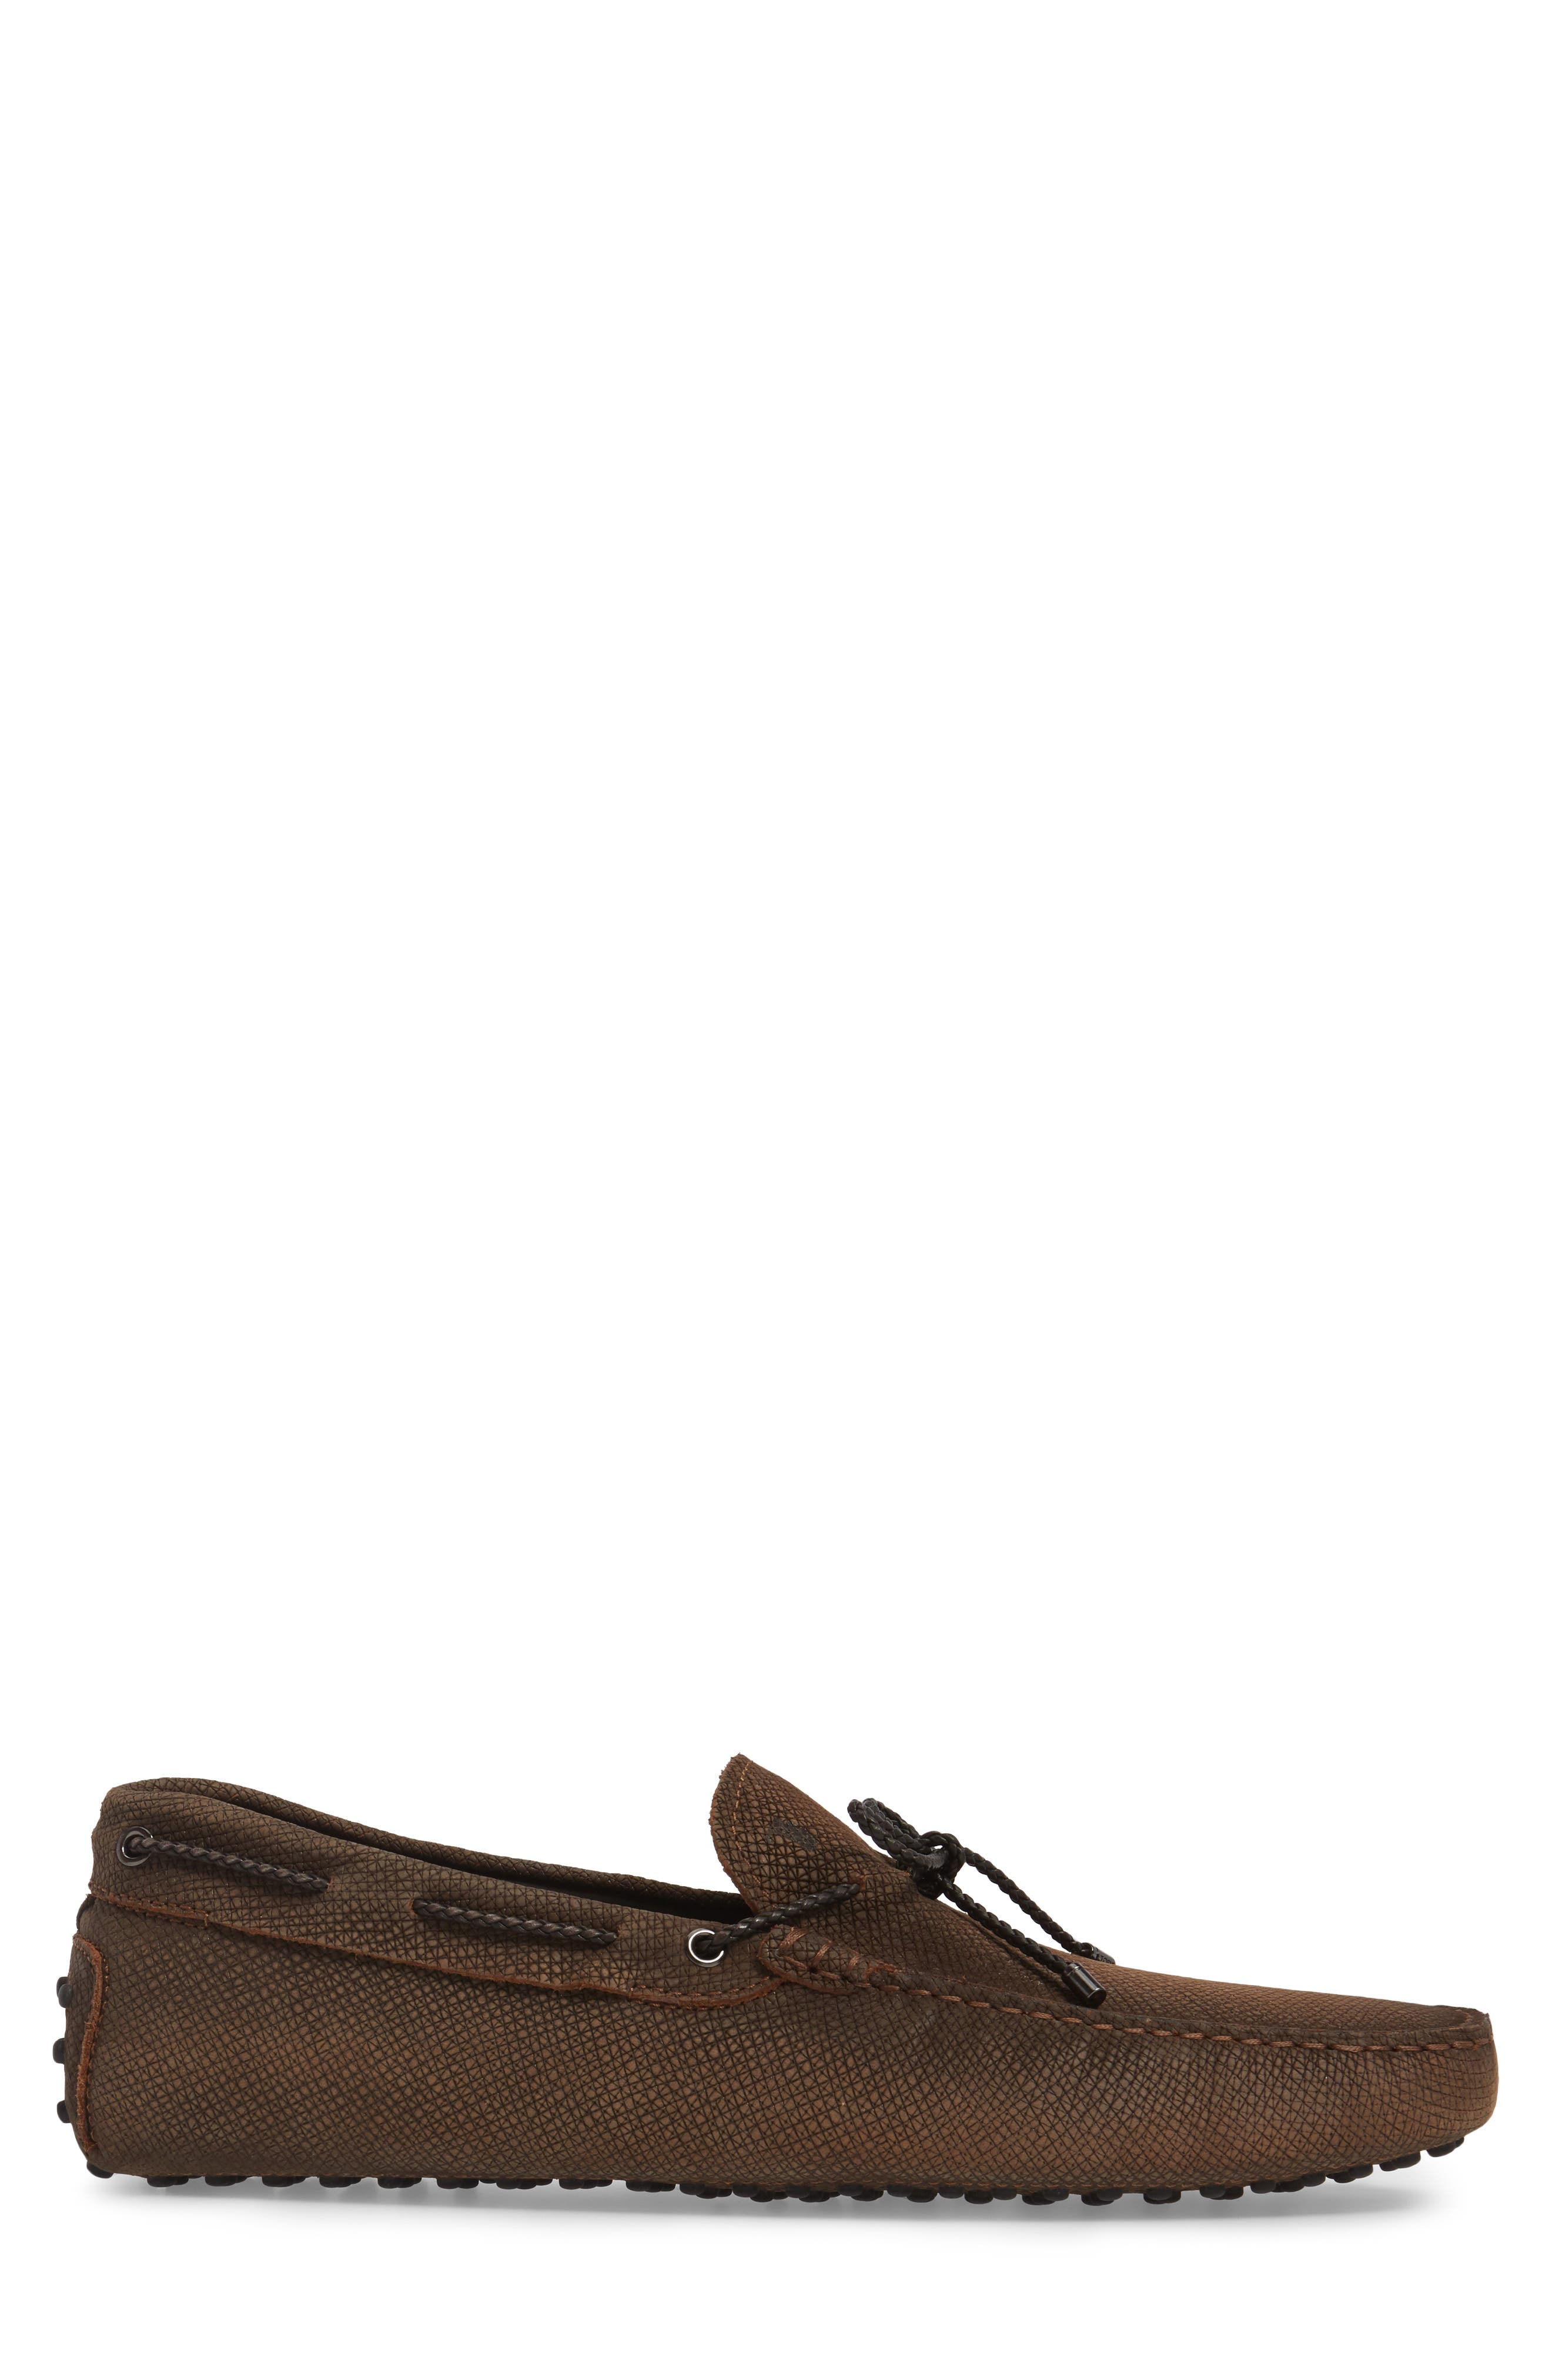 Alternate Image 3  - Tod's Gommin Textured Driving Shoe (Men)